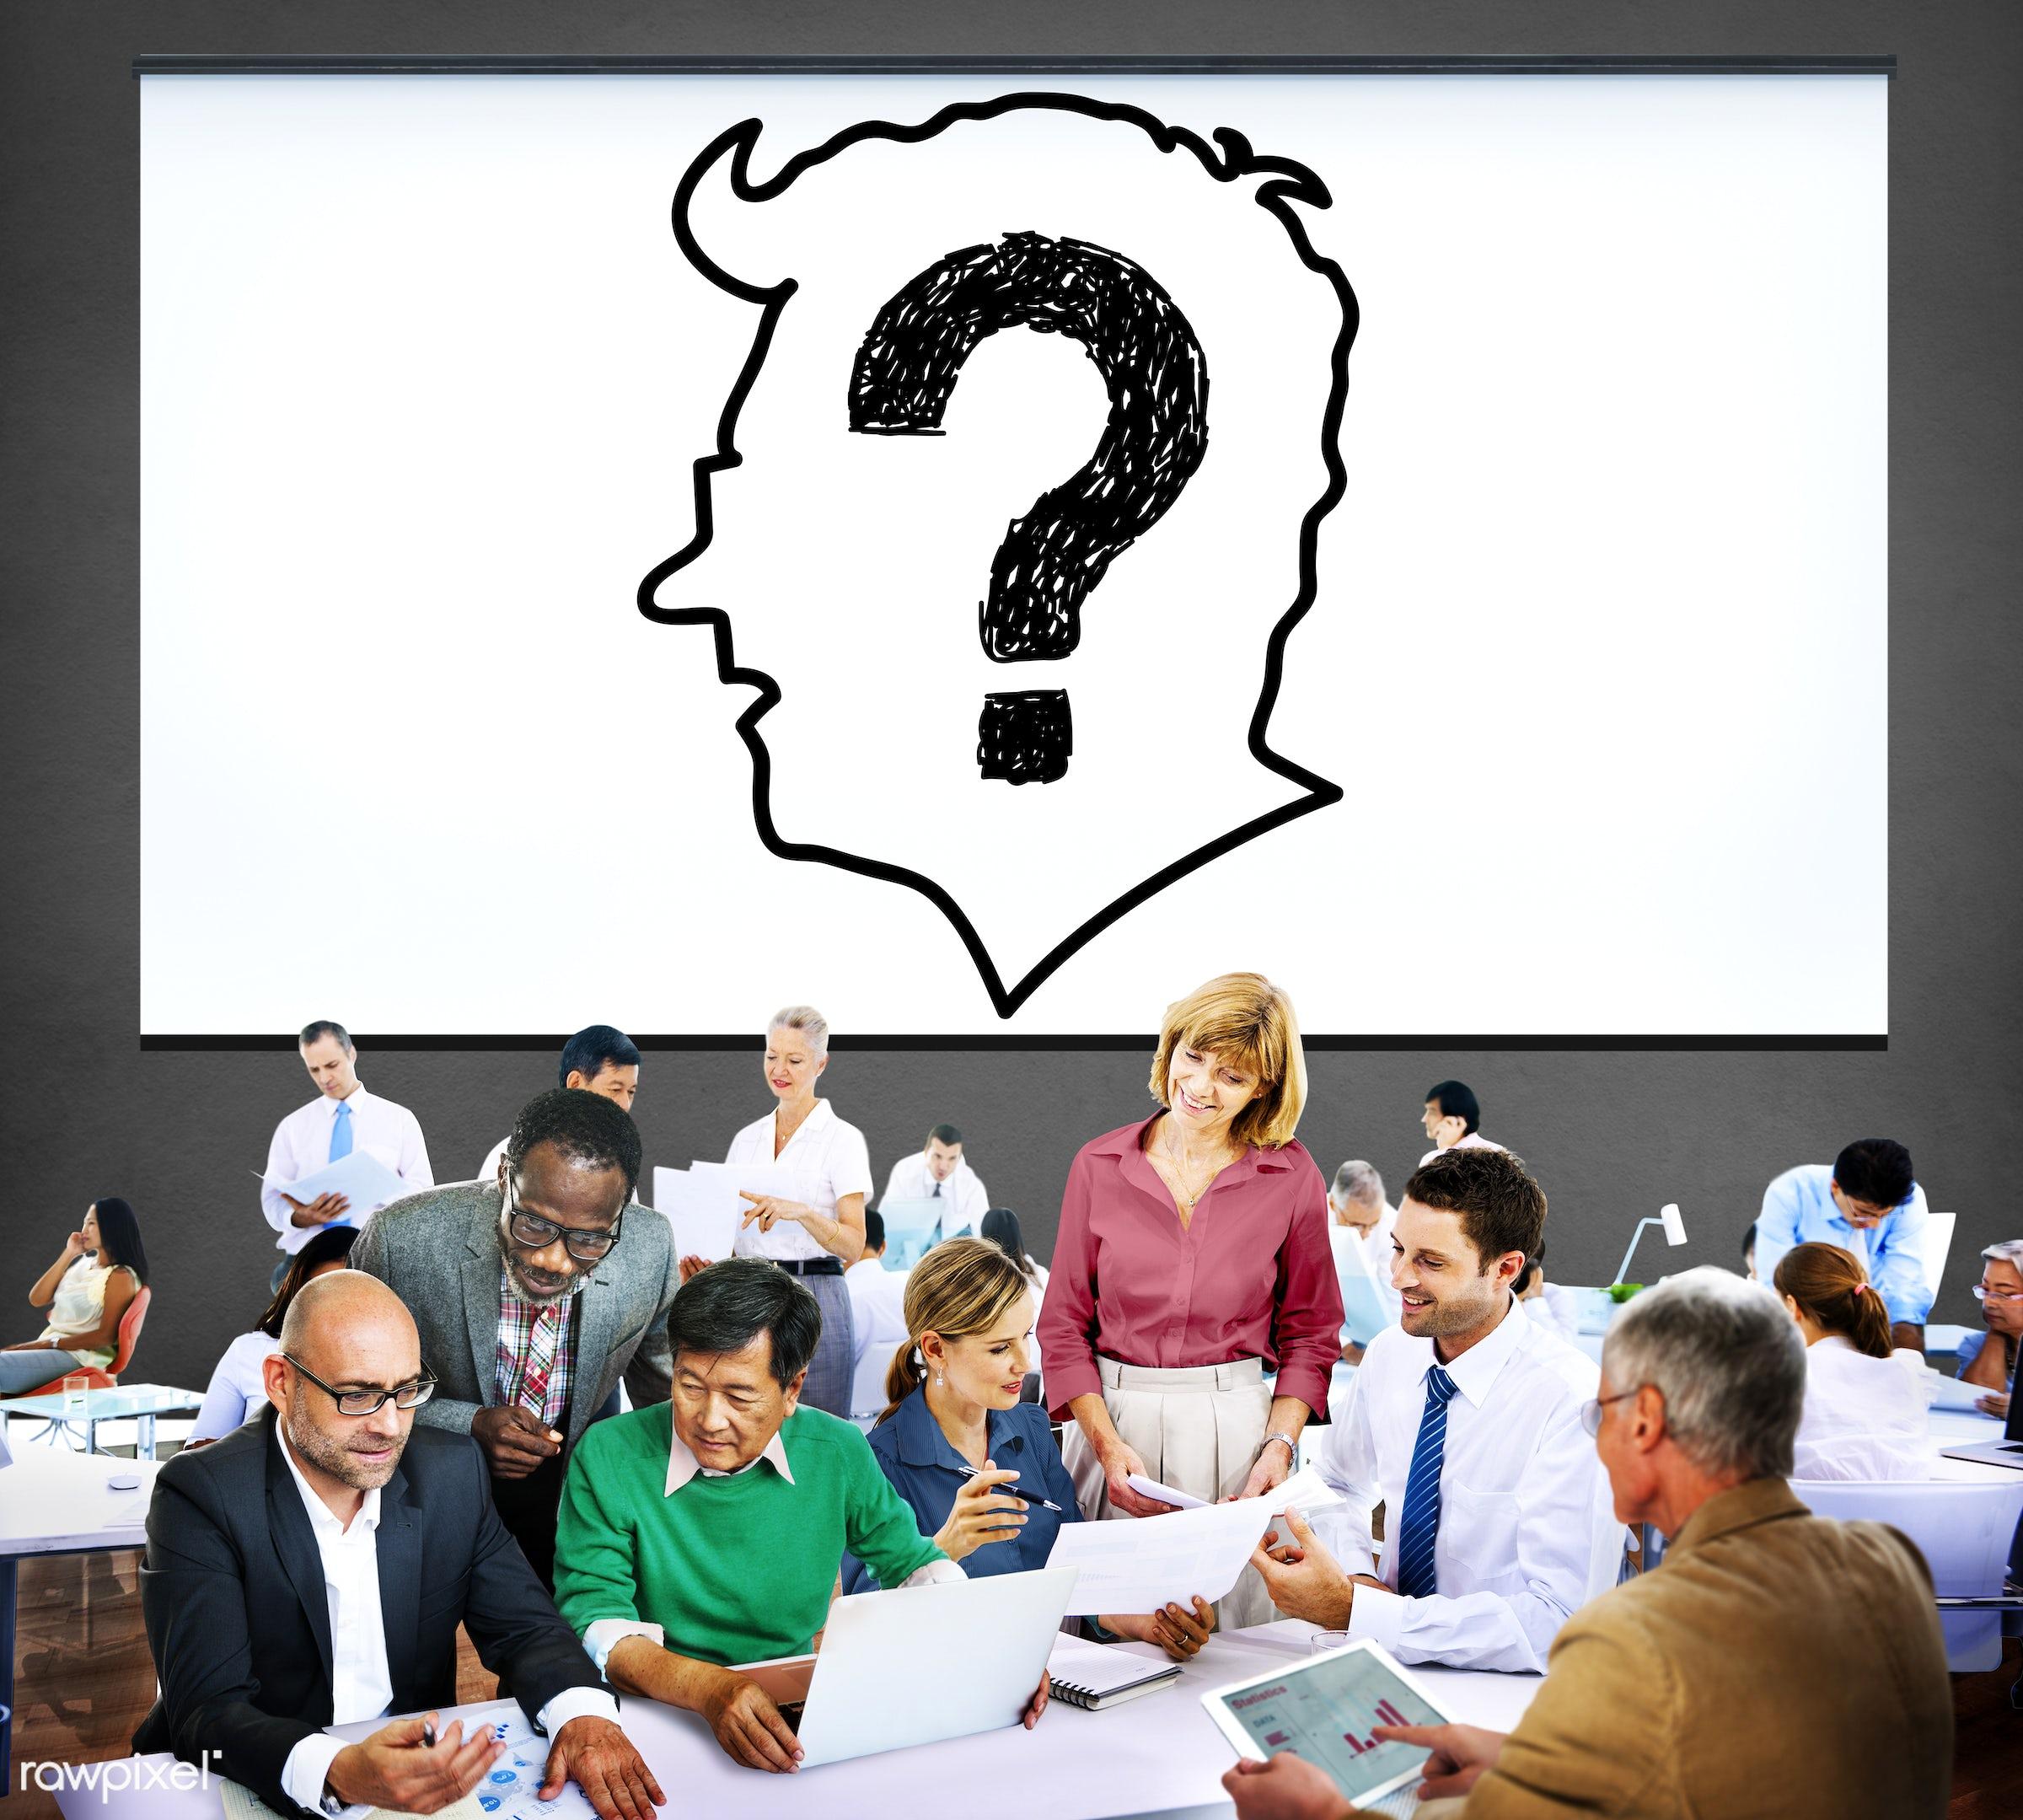 analysis, aspirations, brainstorming, bulb, business, business people, businessmen, businesswomen, busy, communication,...